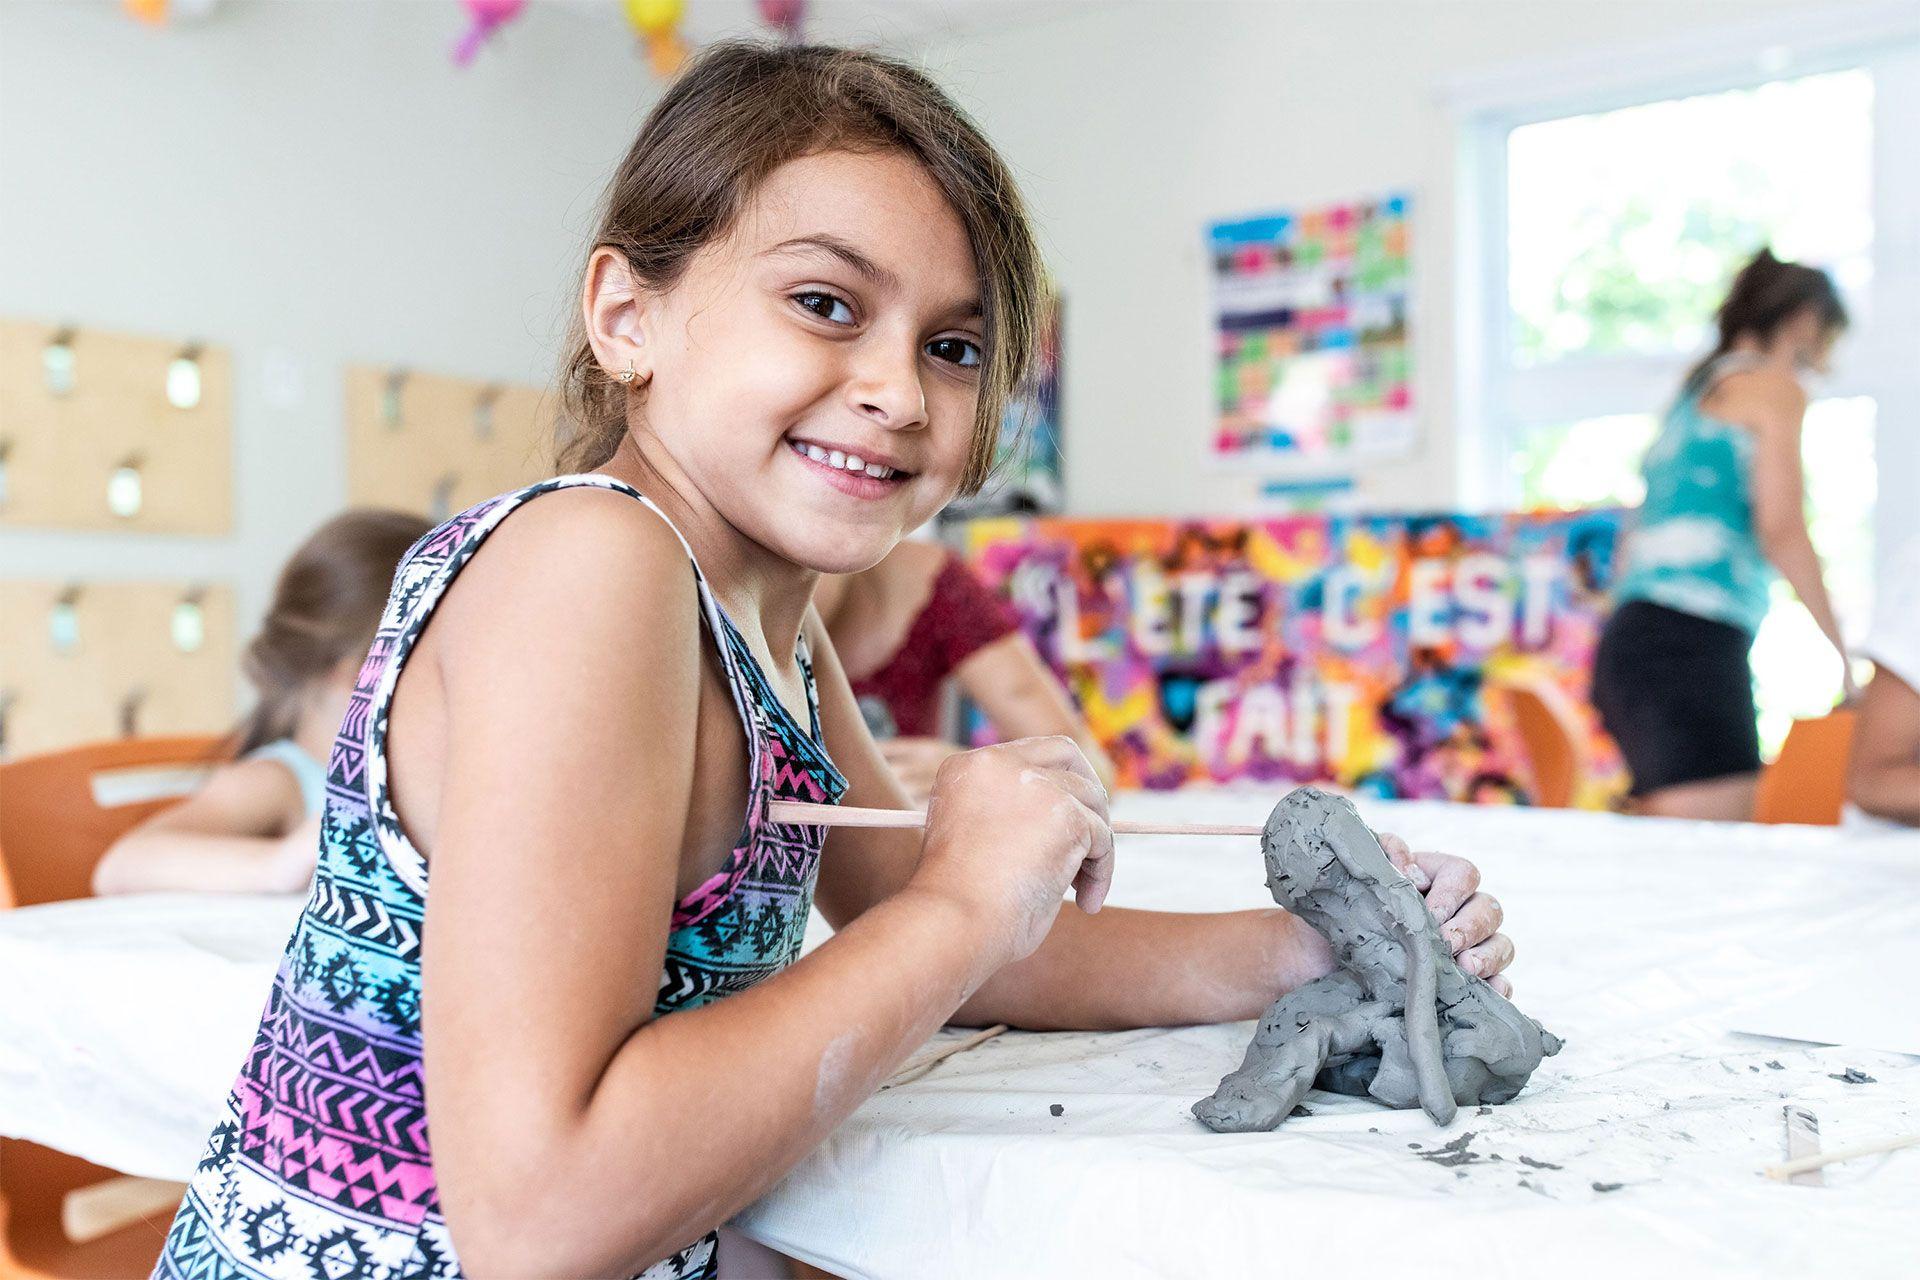 A child makes sculpture.